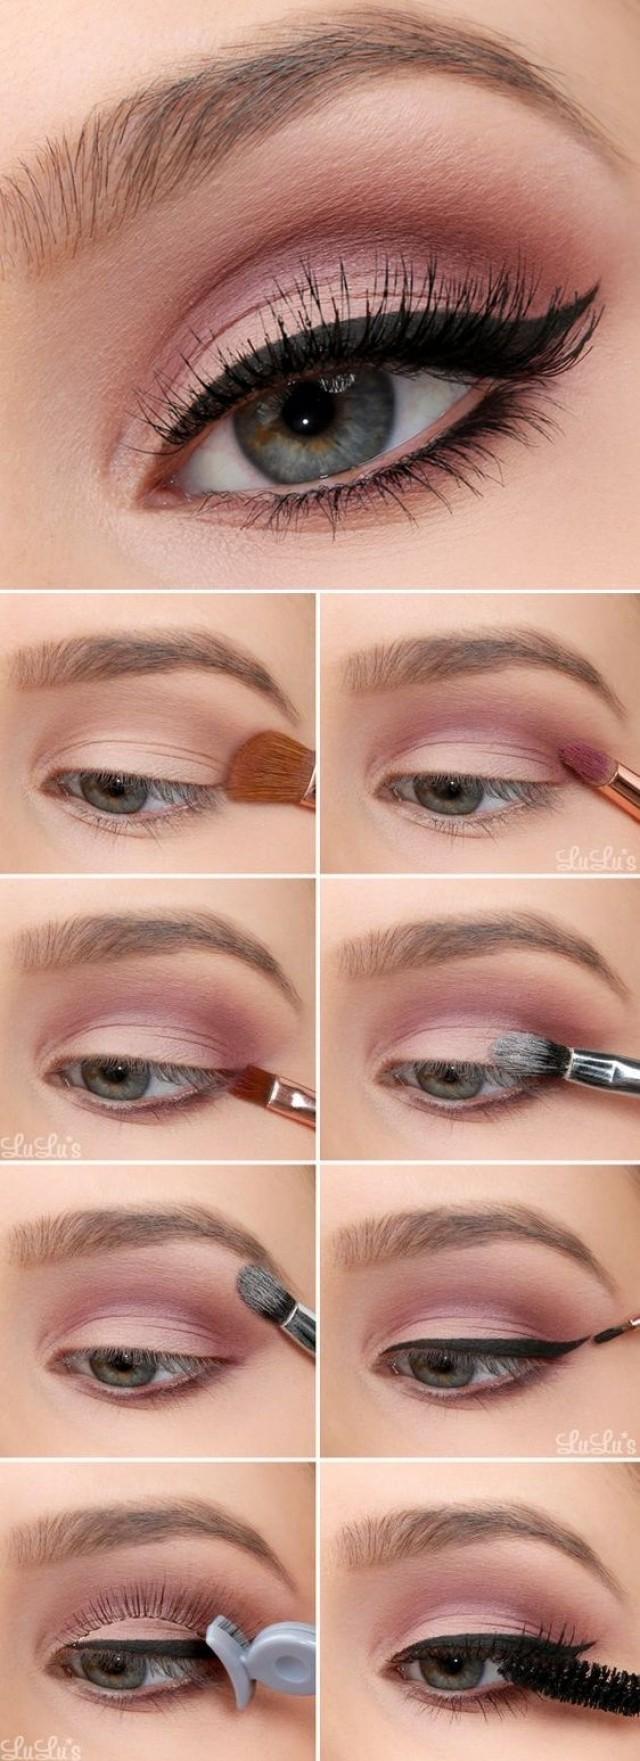 10 Hermosas Ideas Para Pintar Tus Ojos De Rosa 2820734 Weddbook